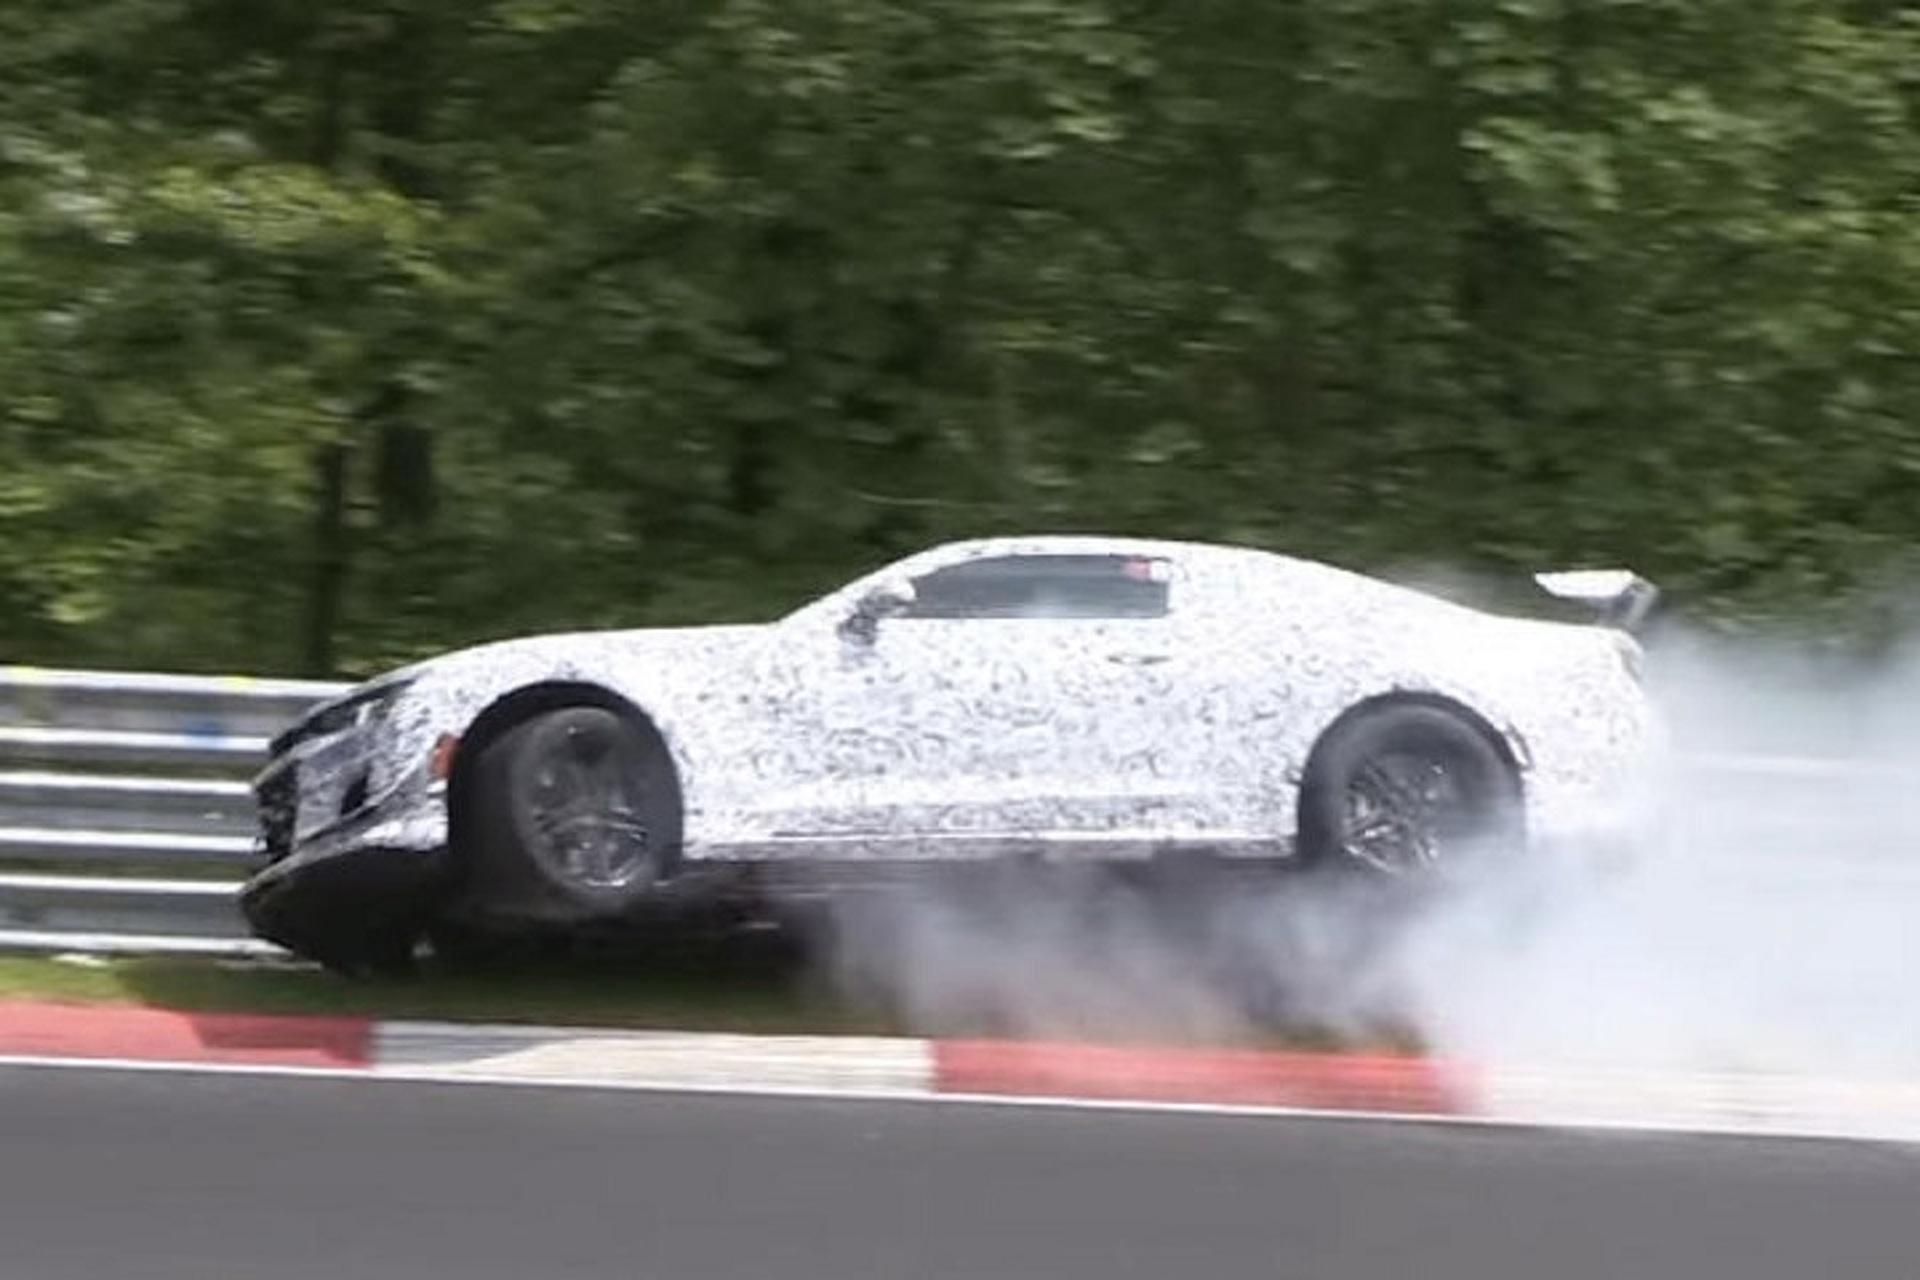 2017 Camaro Z/28 Prototype Hits the Wall Hard at Nürburgring